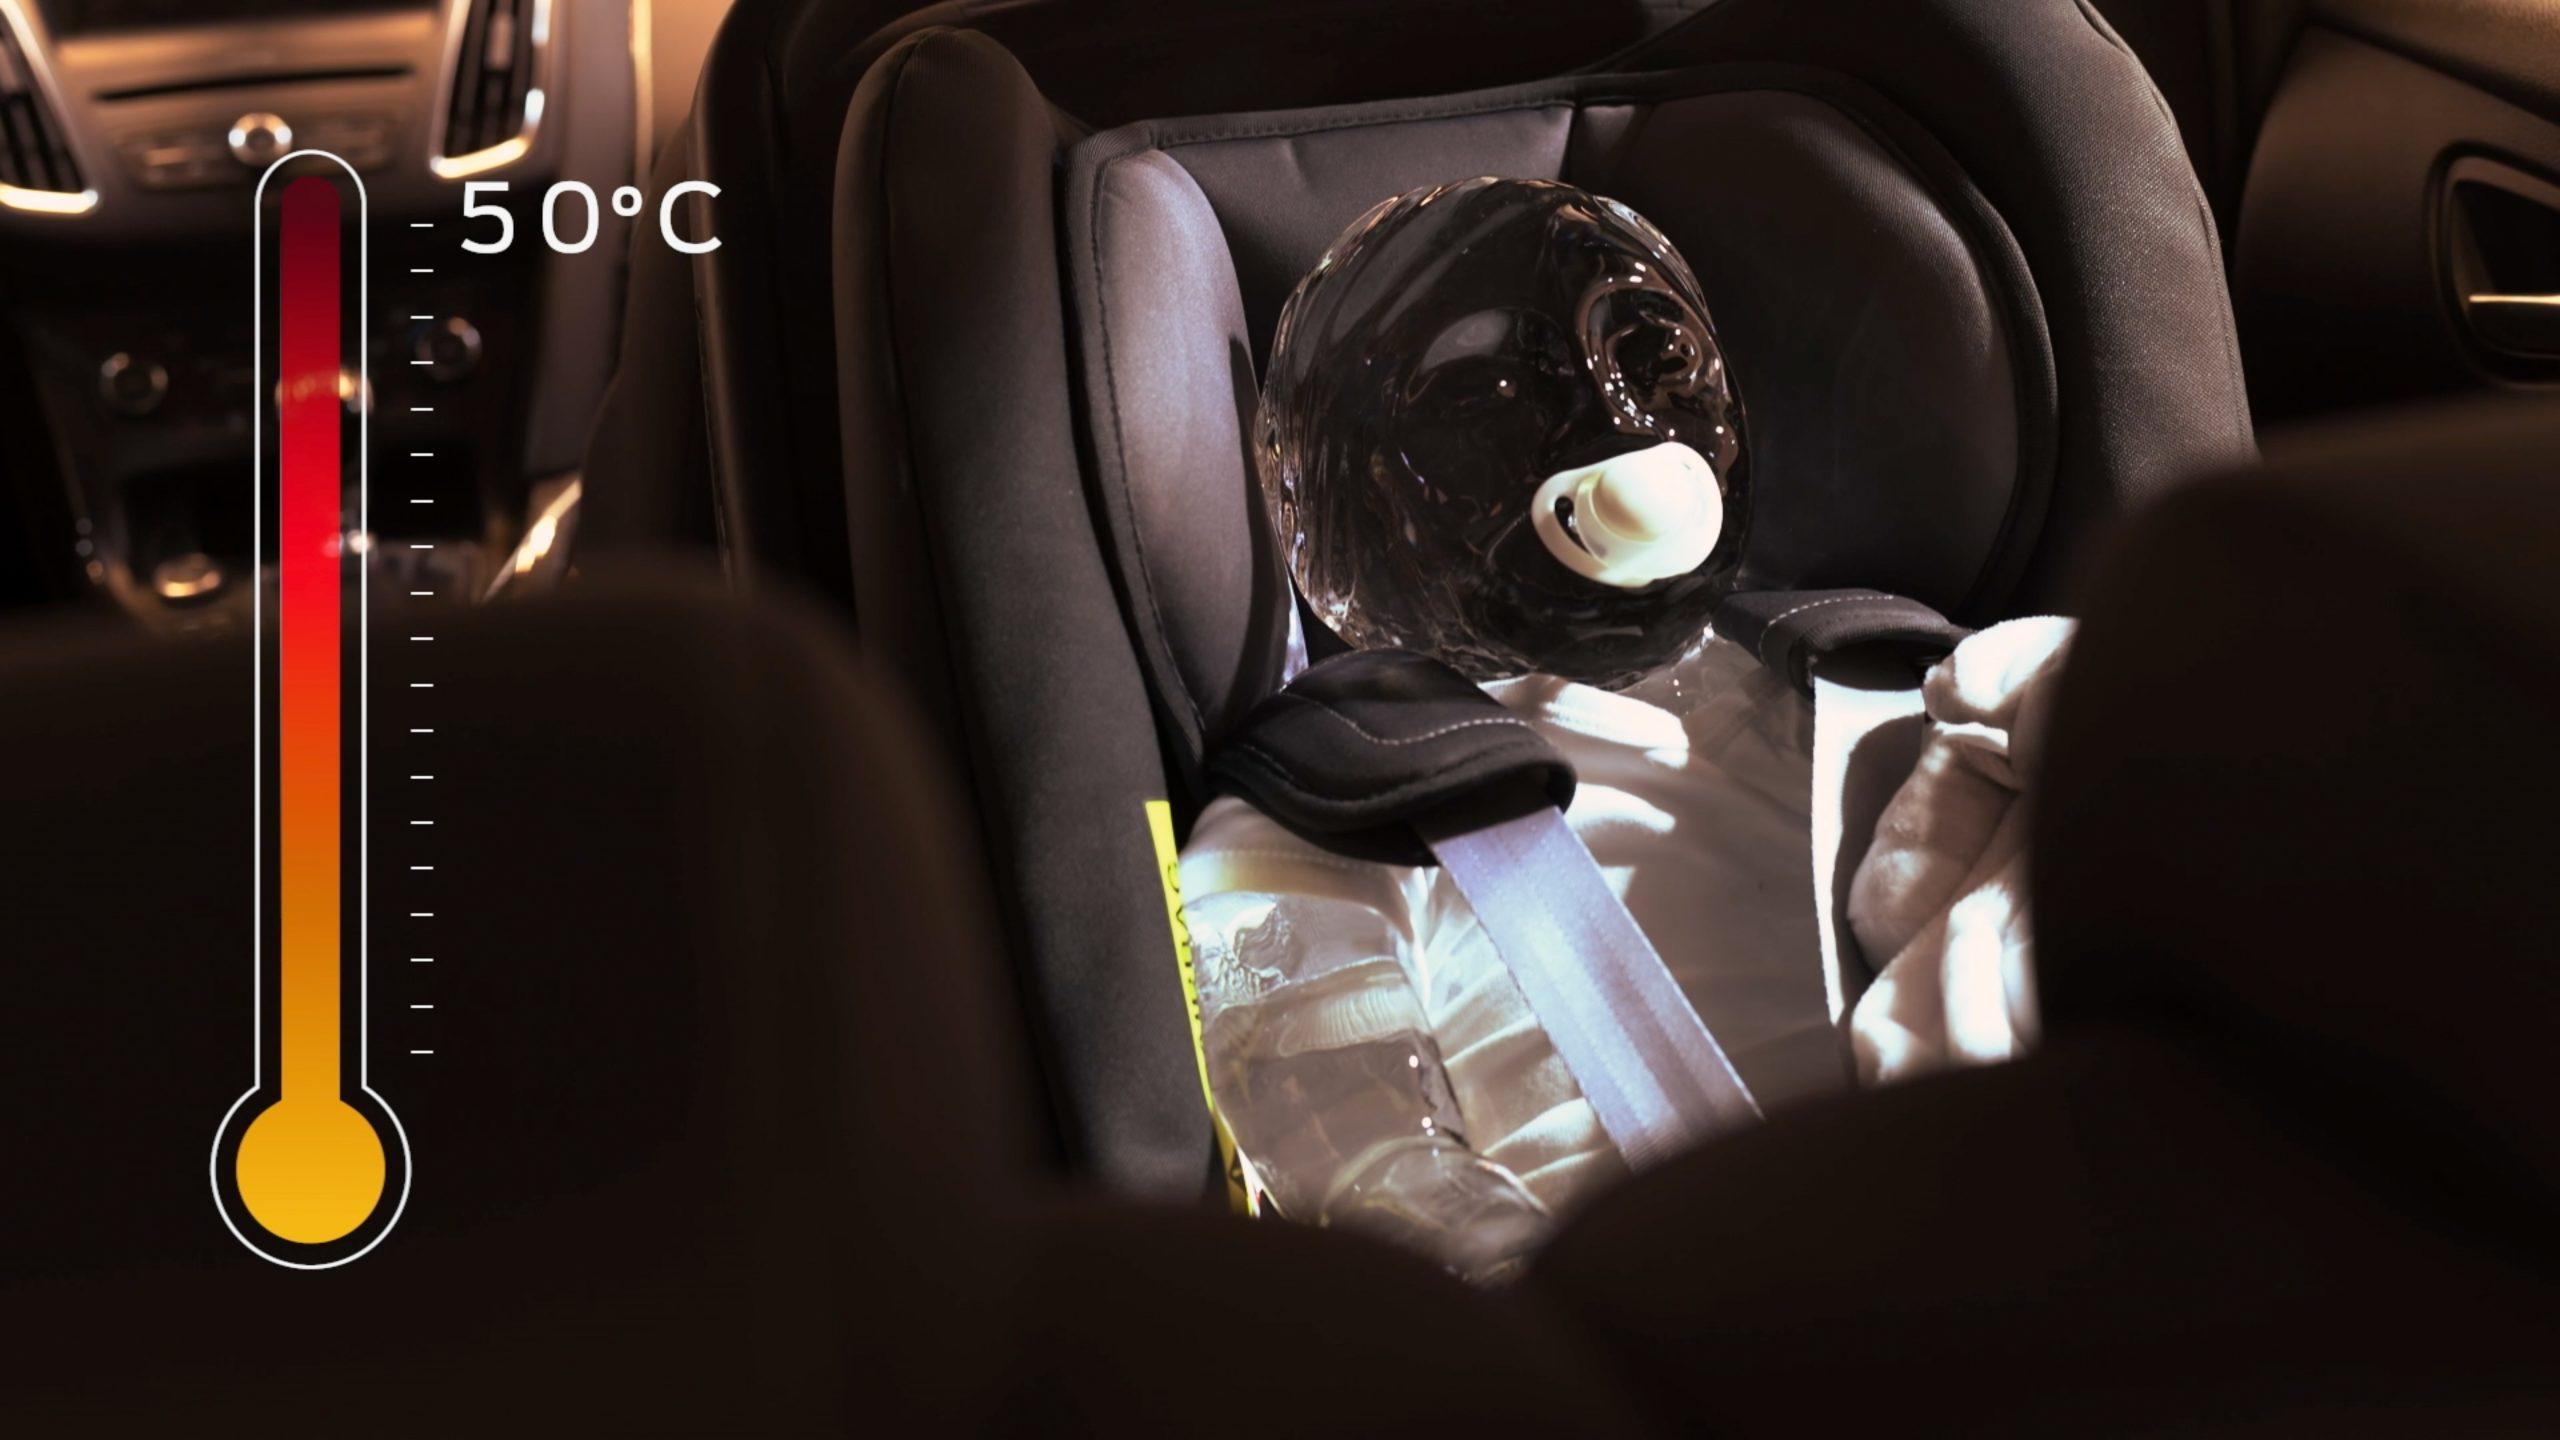 VideoScreenshot scaled Ford : Πως μερικά λεπτά στο αυτοκίνητο το καλοκαίρι, μπορούν να αποβούν μοιραία για παιδιά και κατοικίδια Ford, zblog, ασφάλεια, ειδήσεις, Νέα